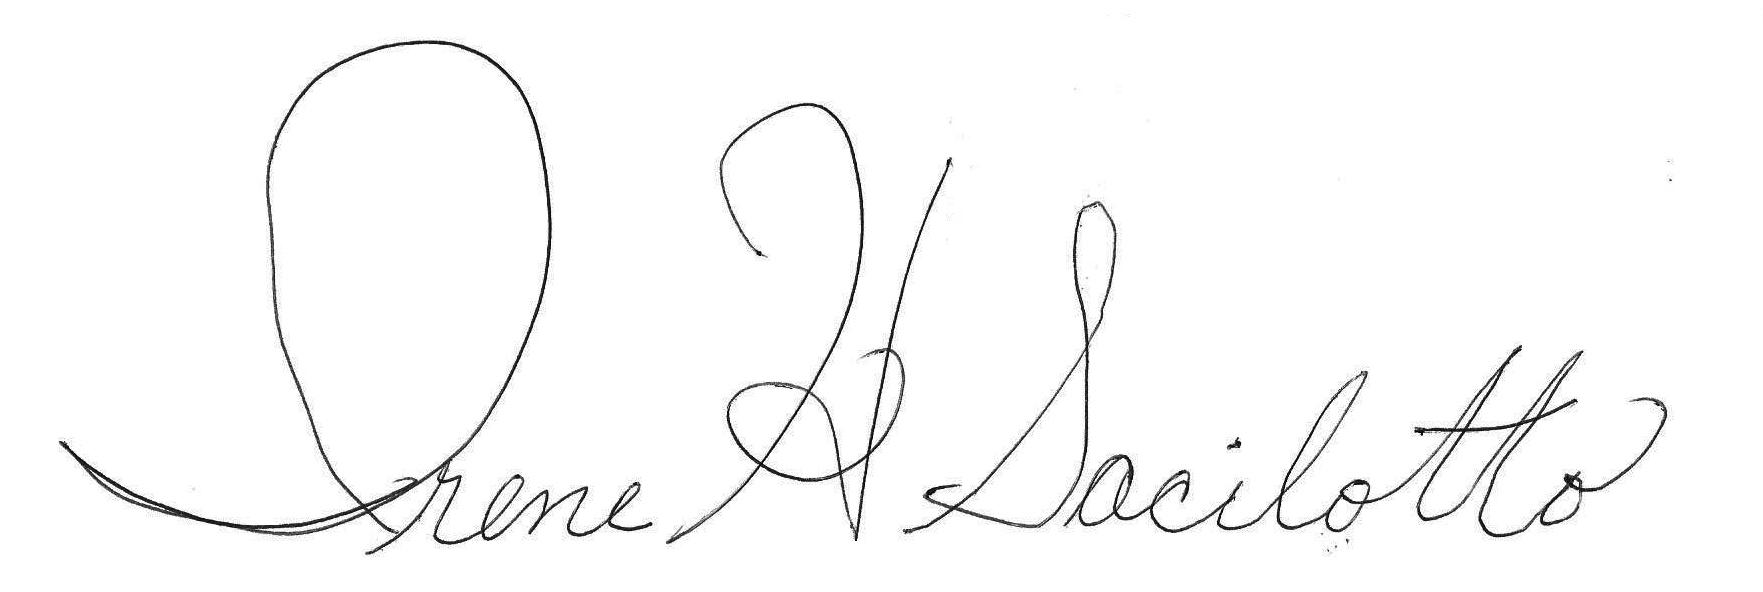 Irene Sacilotto's Signature